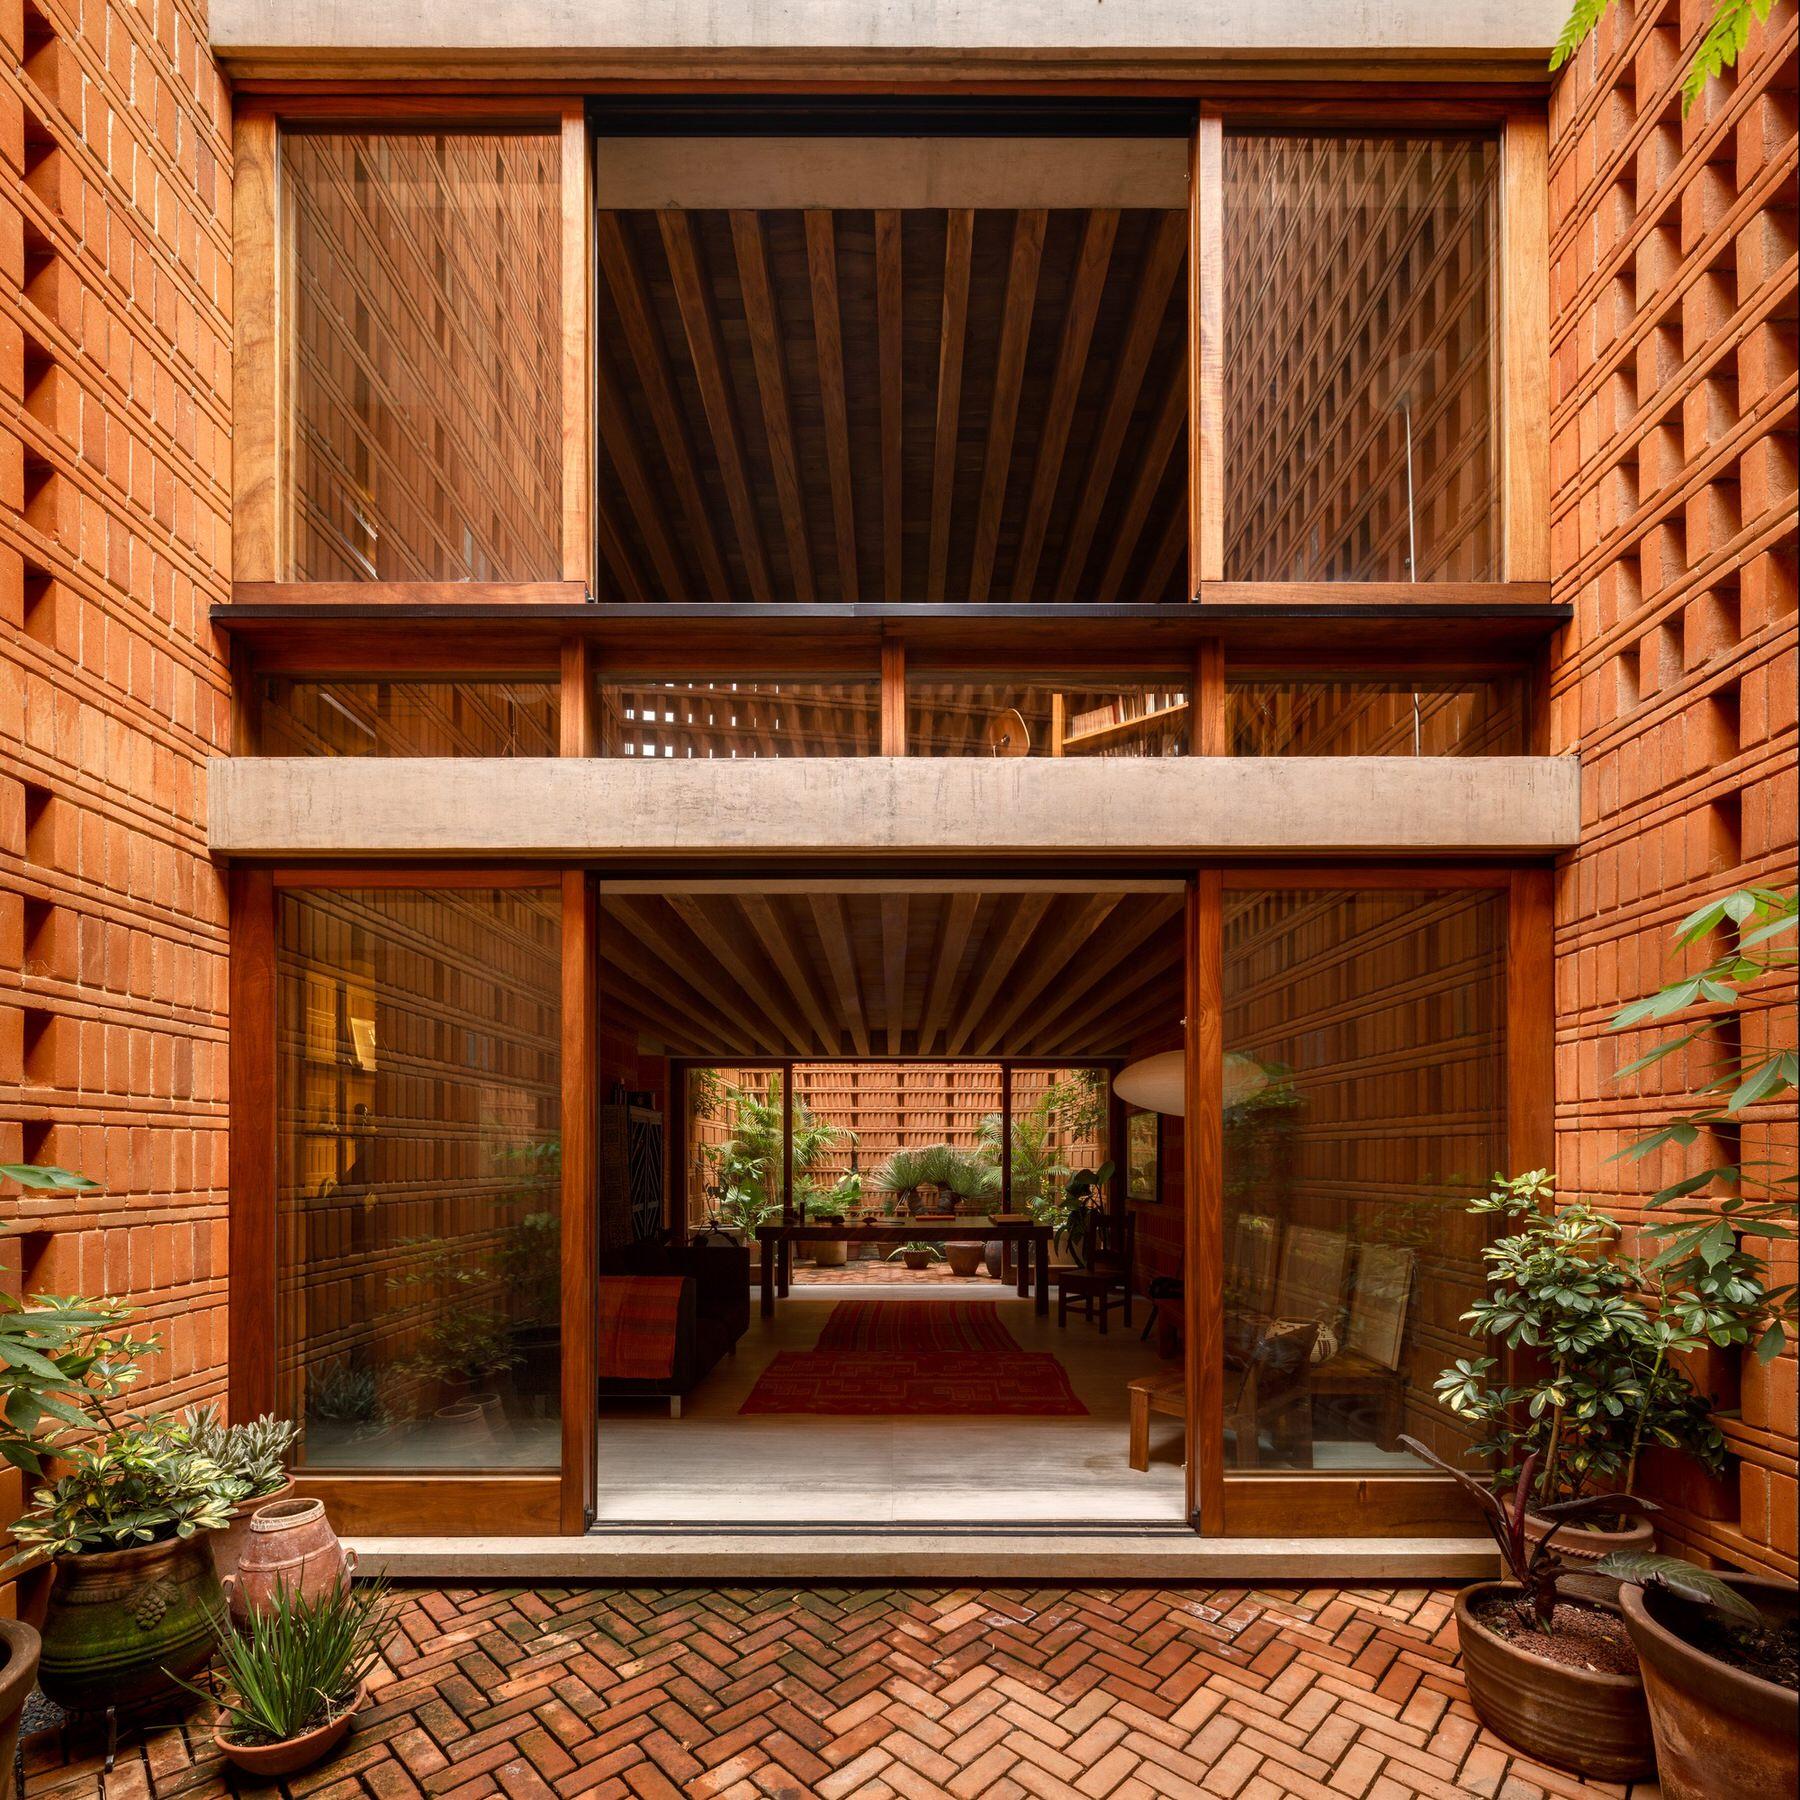 Iturbide Studio Mexico City Brick Architecture Taller Mauricio Rocha Gabriela Carrillo Yellowtrace 18